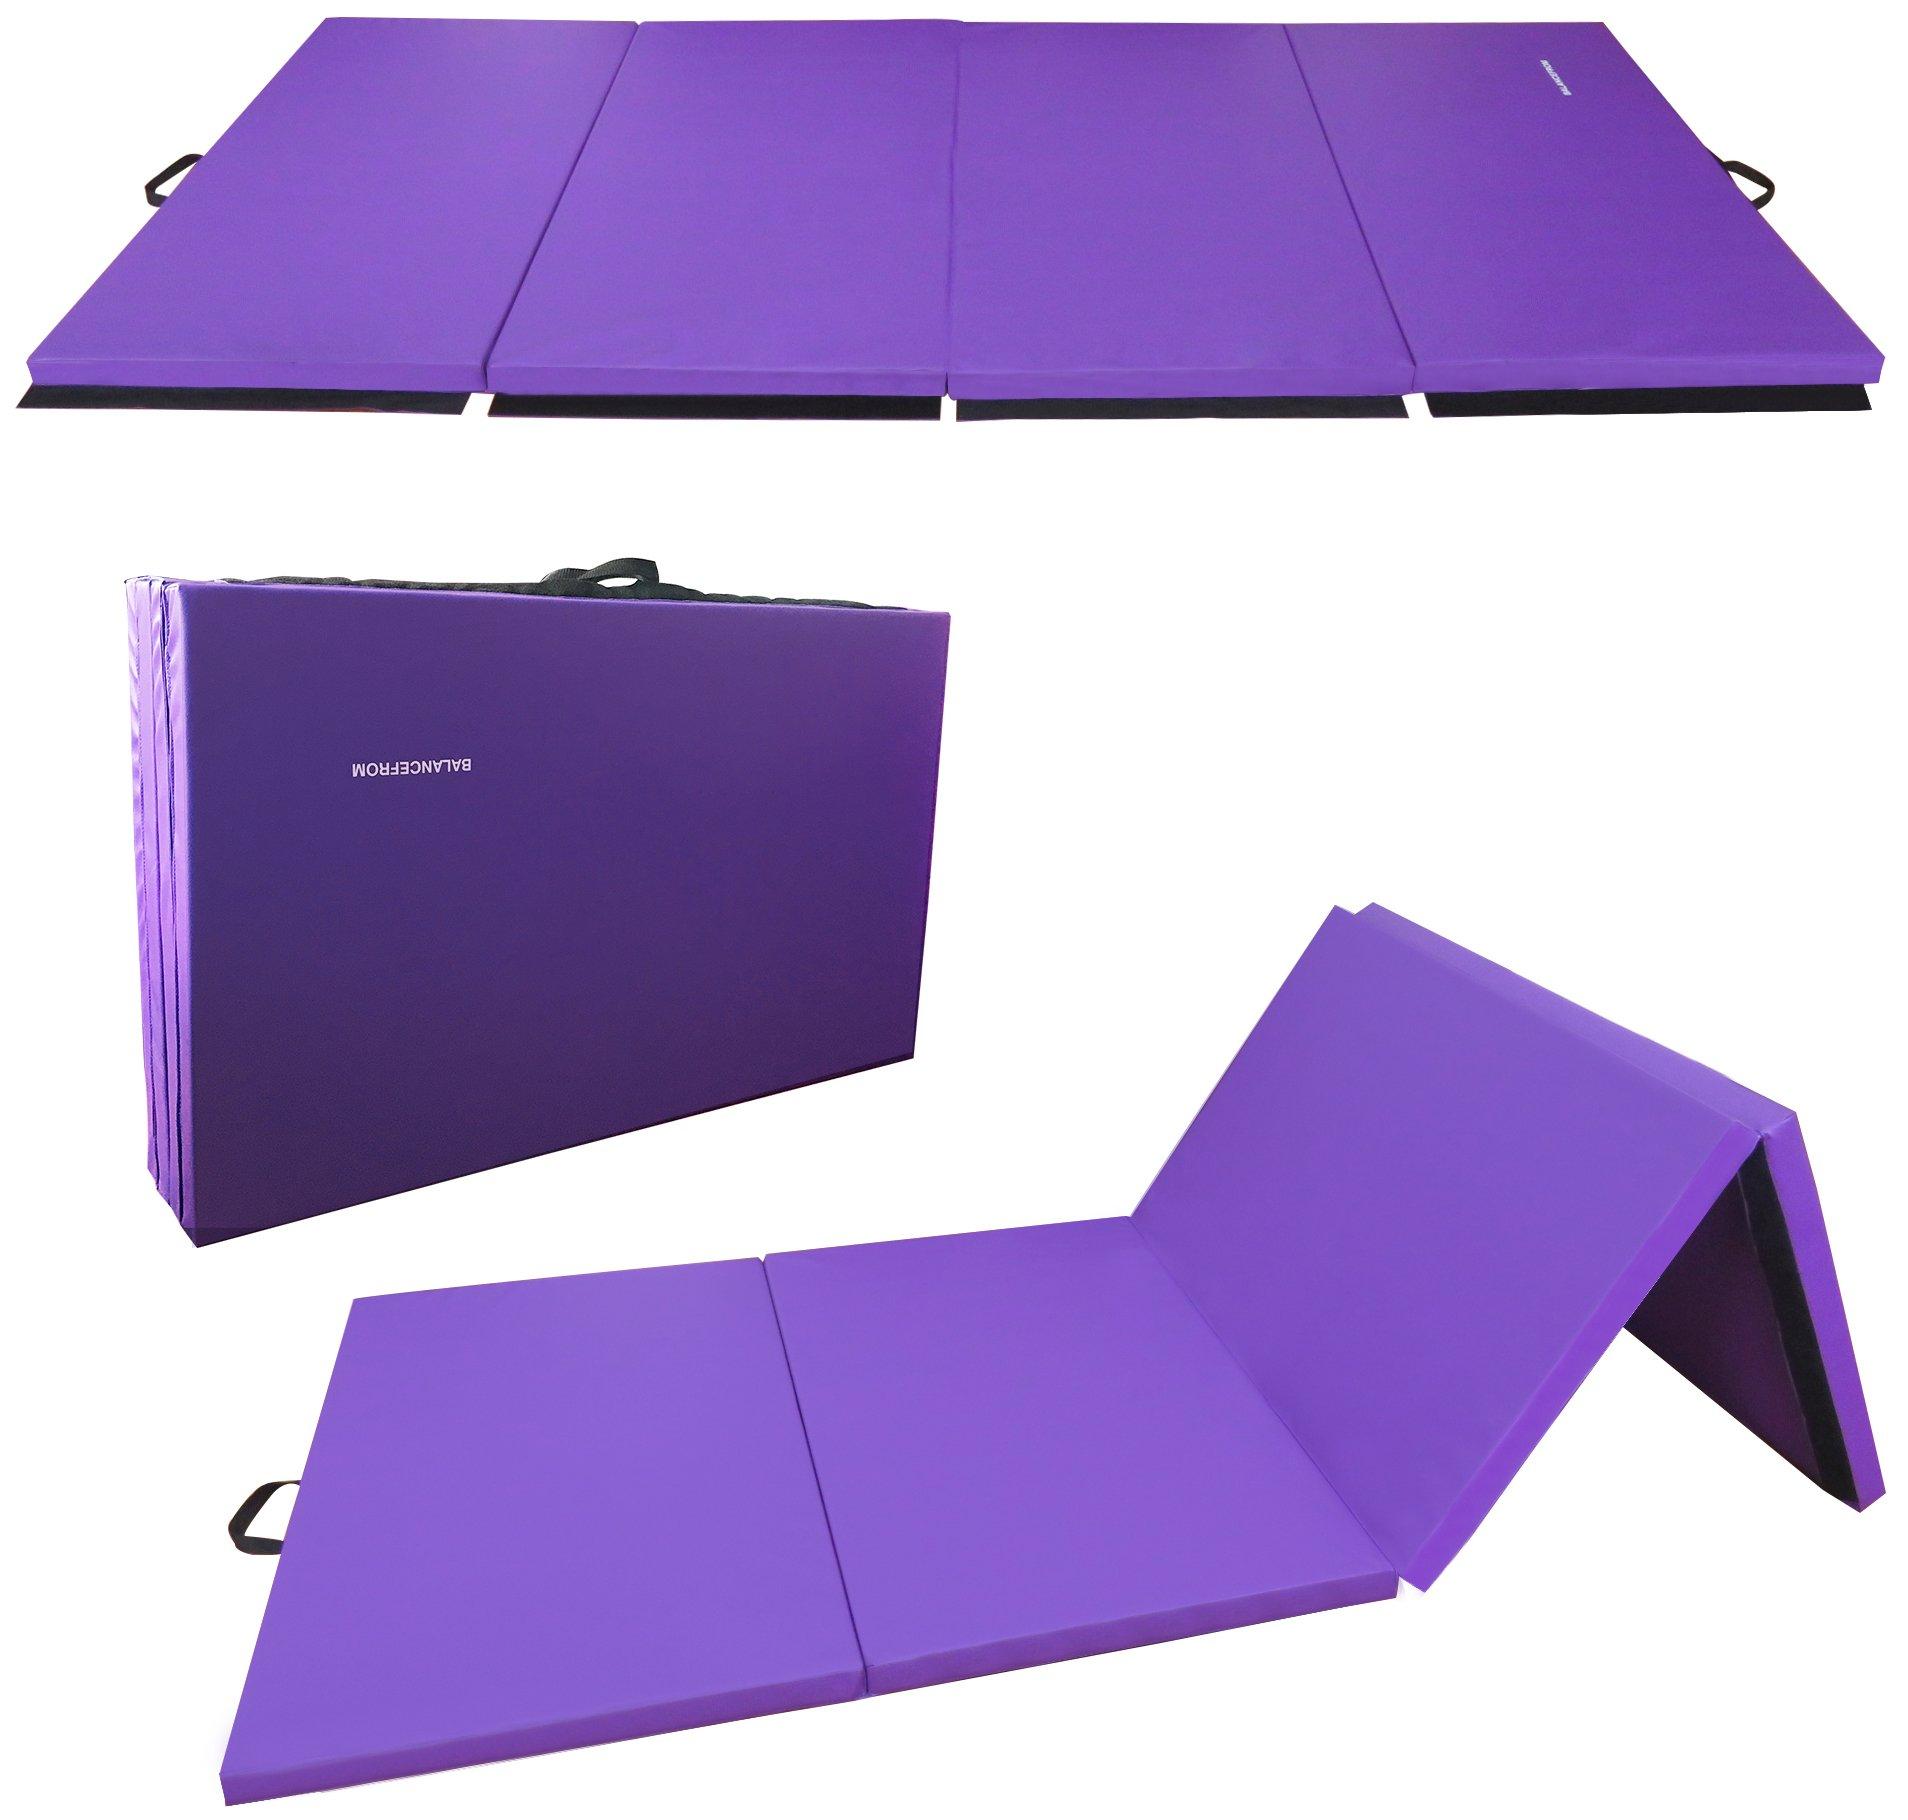 BalanceFrom BFGR-01PP All-Purpose Extra Thick High Density Anti-Tear Gymnastics Folding Exercise Aerobics Mats, 4' x 10' x 2'' by BalanceFrom